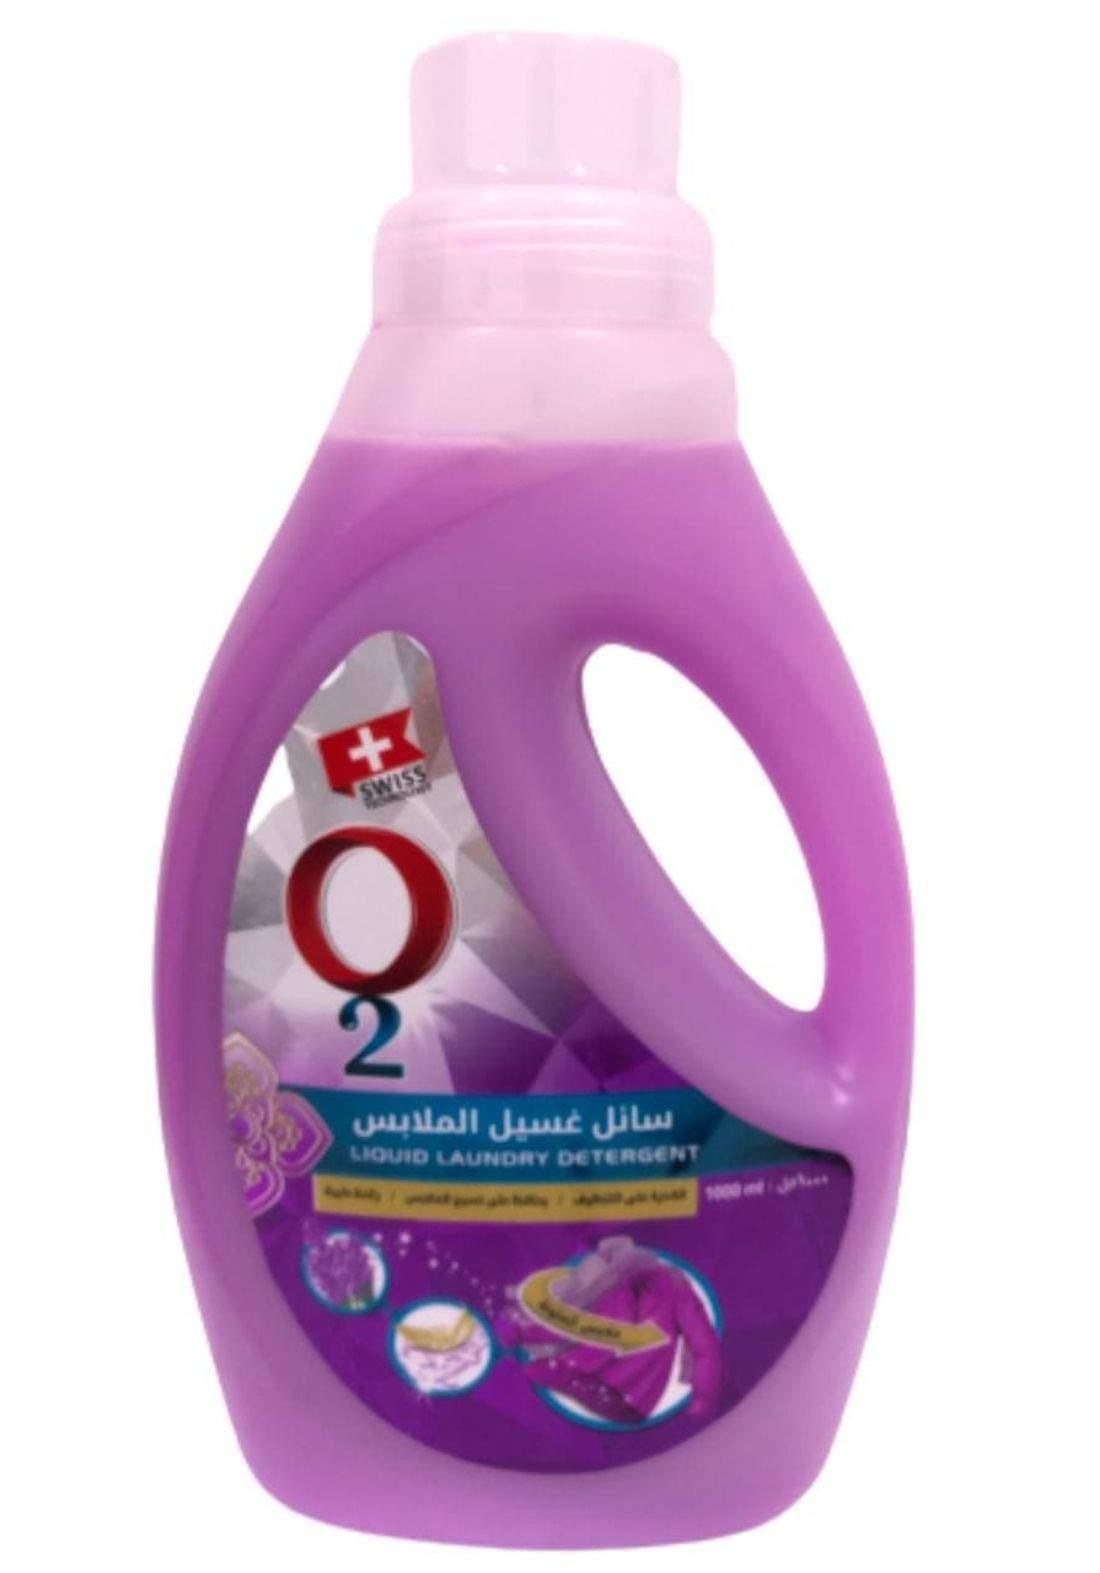 O2 Liquid laundry detergent 1000ml او تو سائل غسيل الملابس